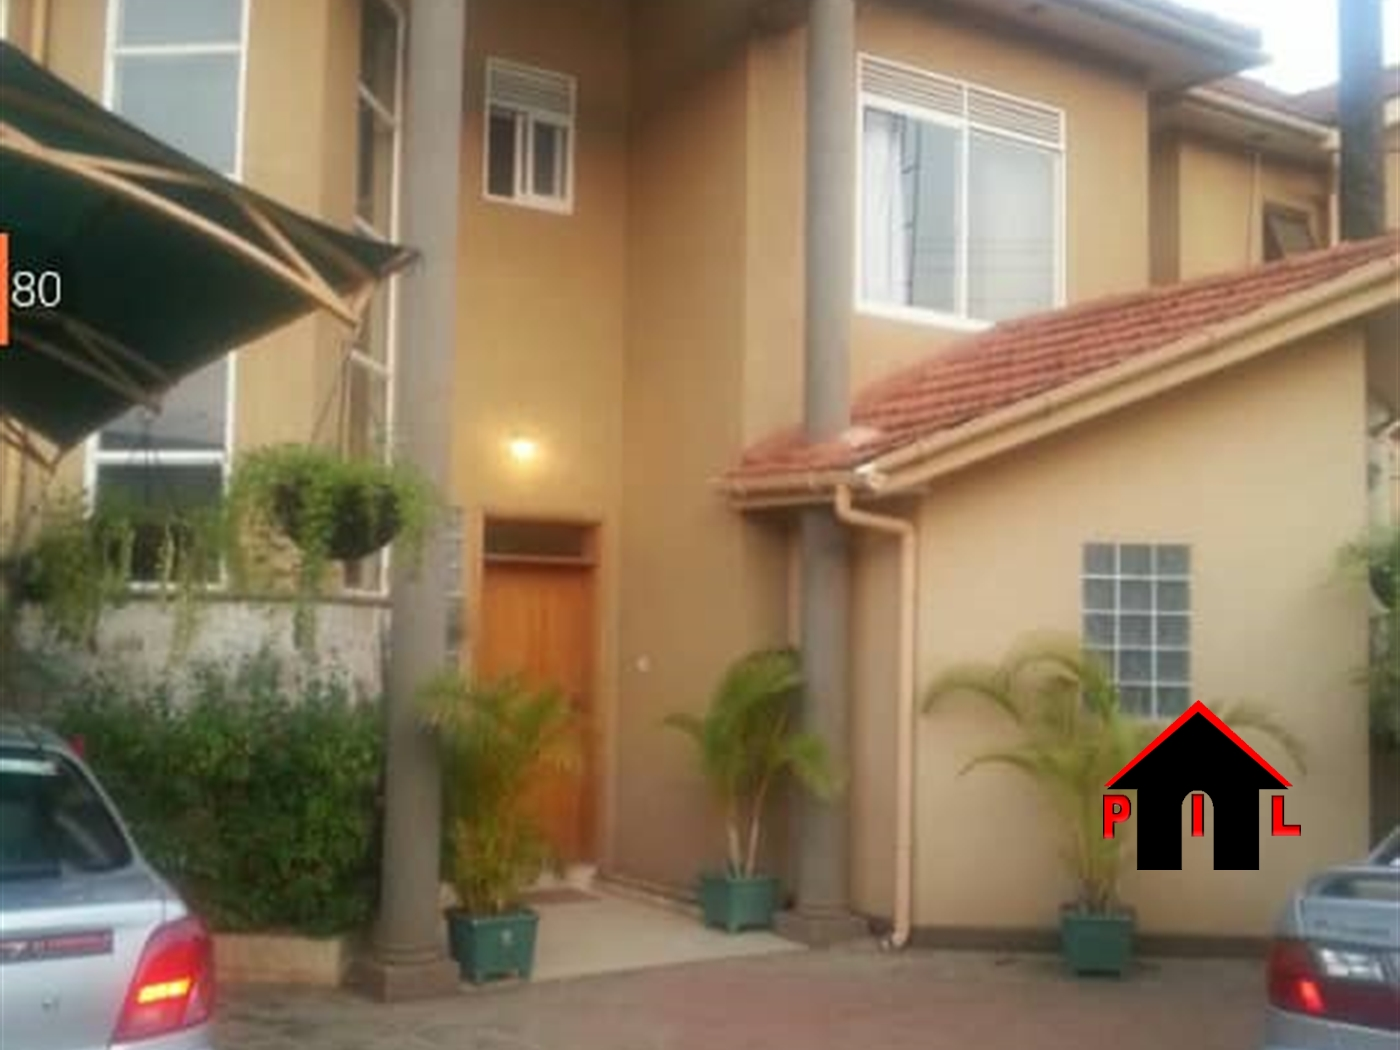 Storeyed house for sale in Bbunga Wakiso